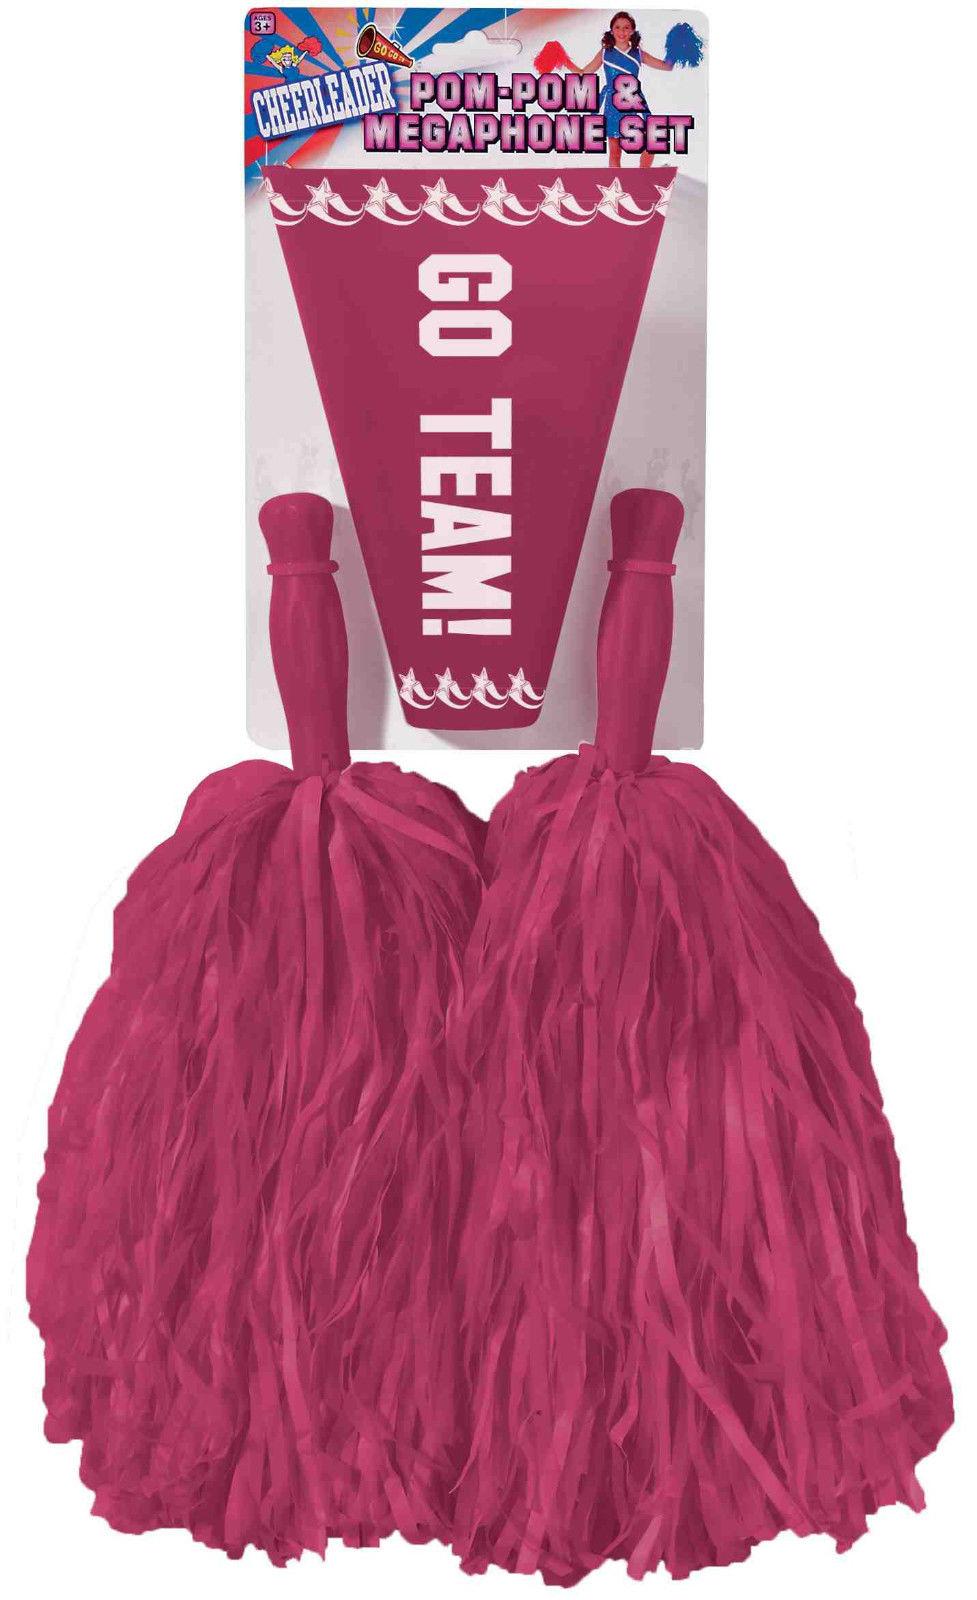 Cheerleader-Pom-Pom-Poms-Megaphone-Cheer-Kit-Set-  sc 1 st  eBay & Cheerleader Pom Pom Poms Megaphone Cheer Kit Set Costume Pompoms Pom ...